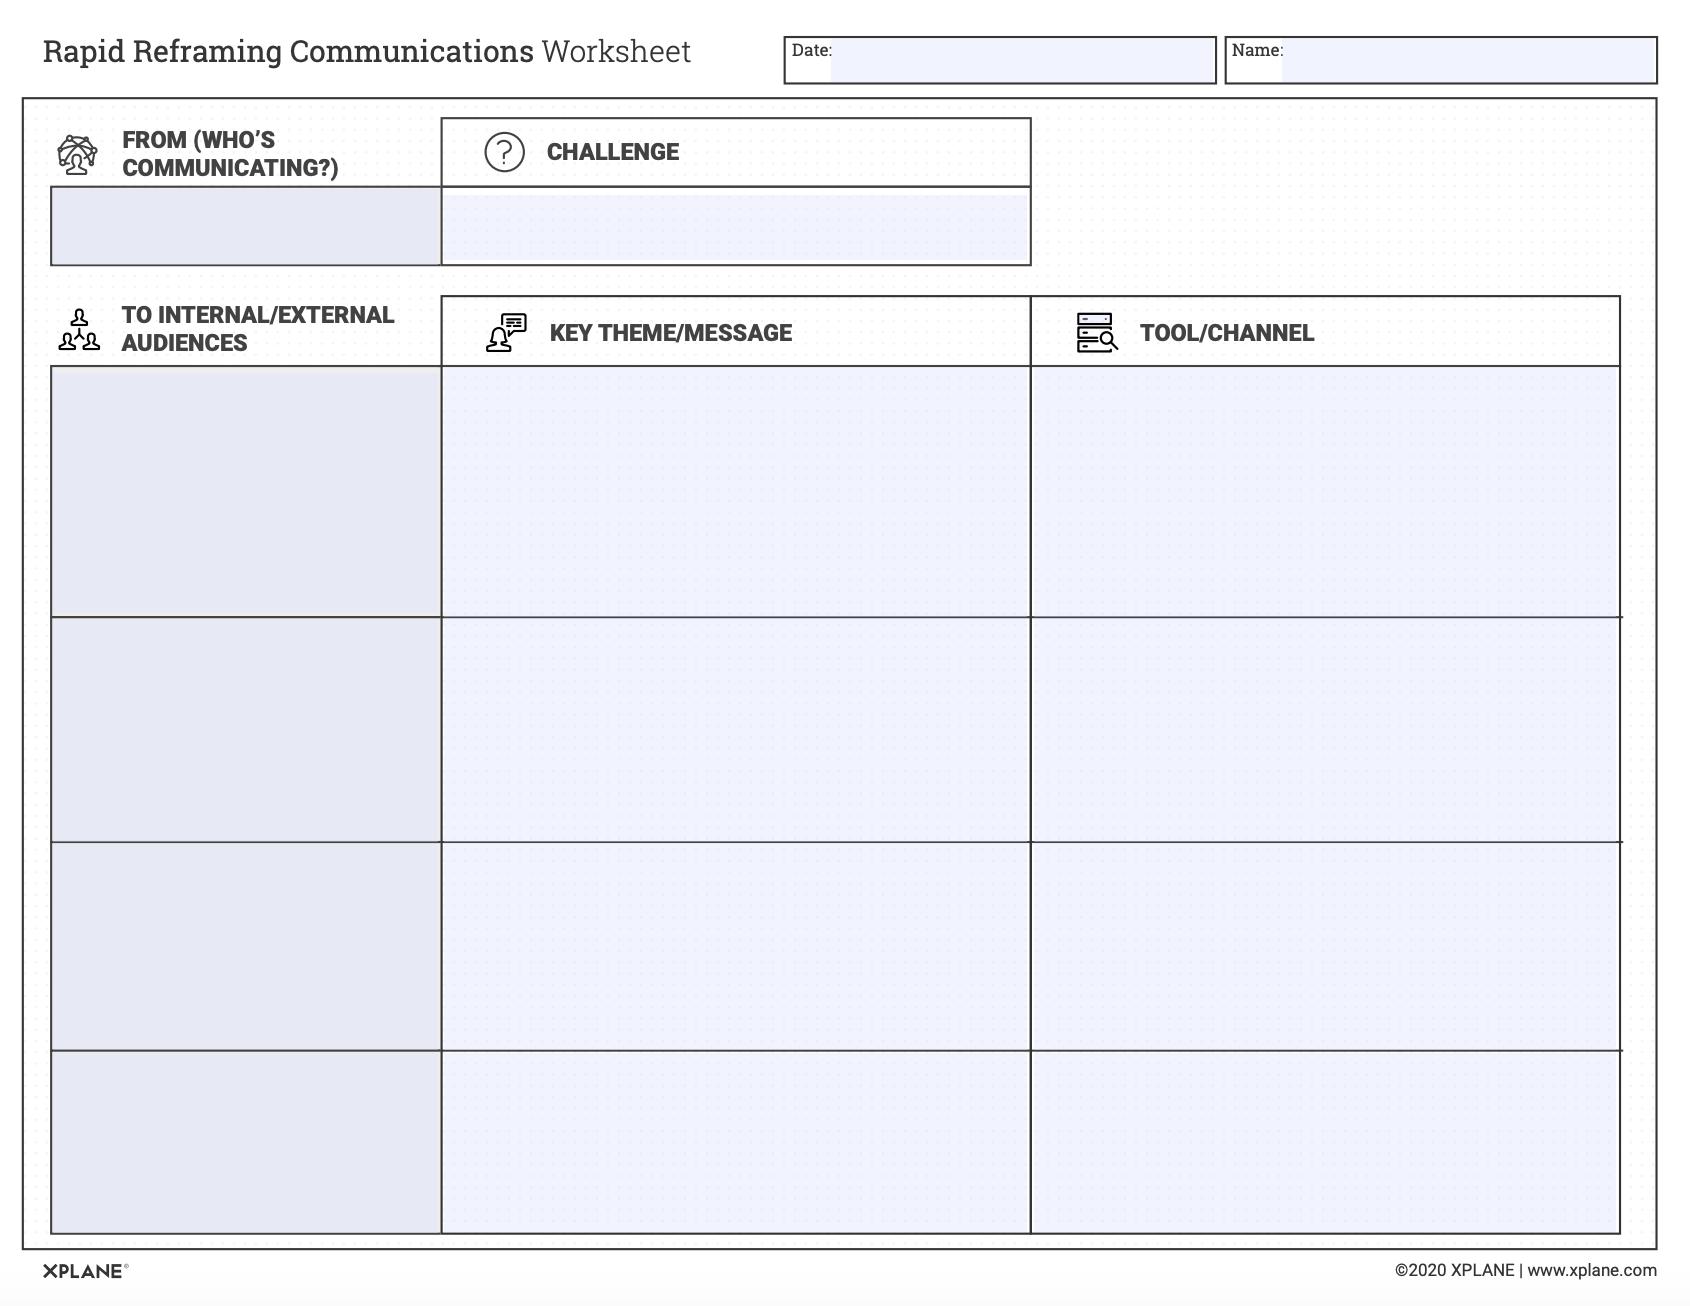 Rapid Reframing Communications Worksheet_Screenshot